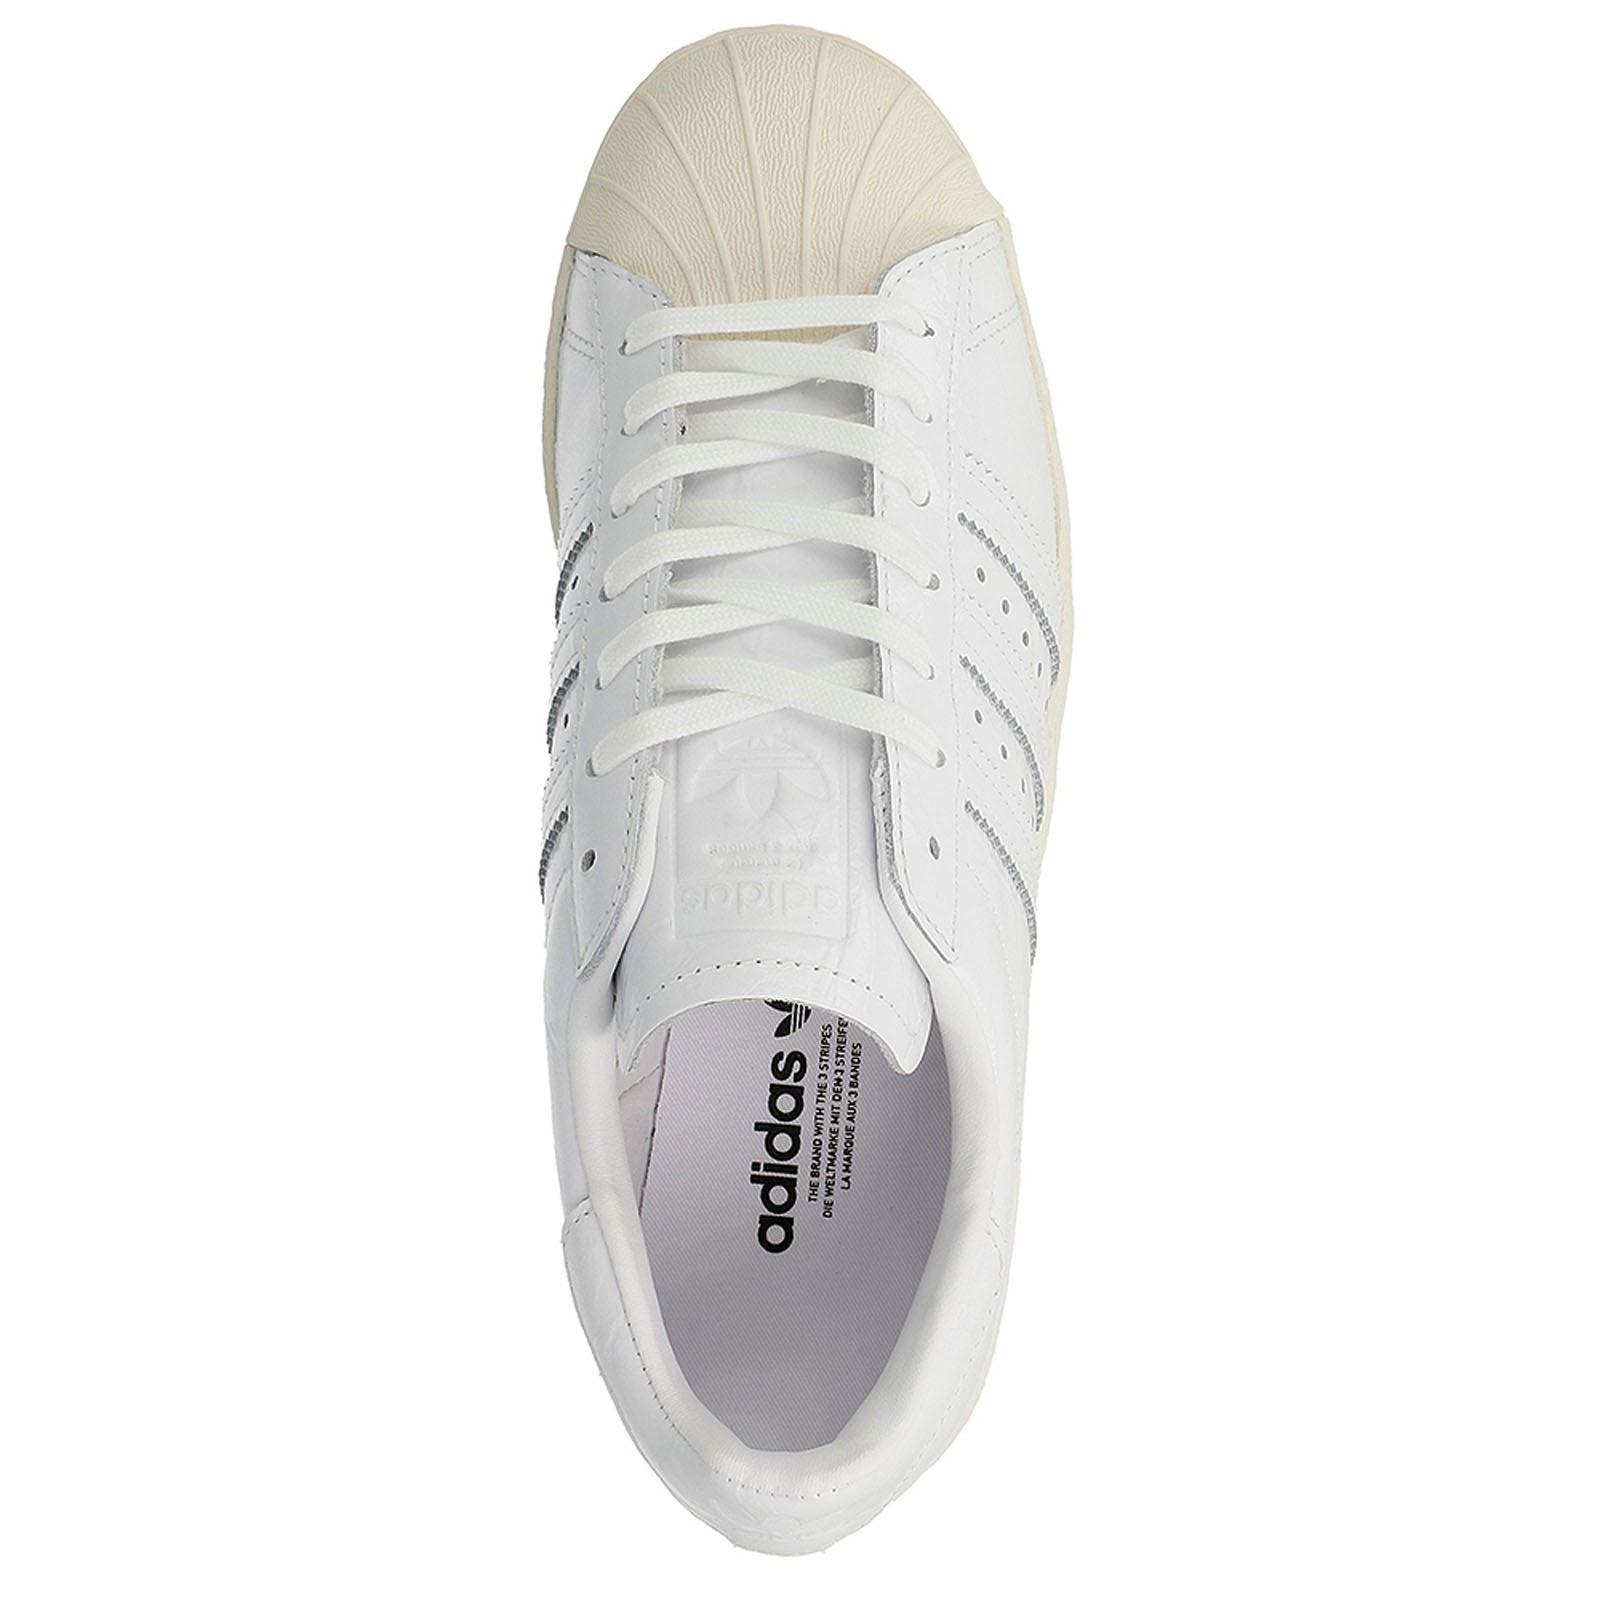 ce8bb8349f4cb adidas Superstar~Womens Trainers~Originals~2 COLOURS~AMAZING PRICE ...